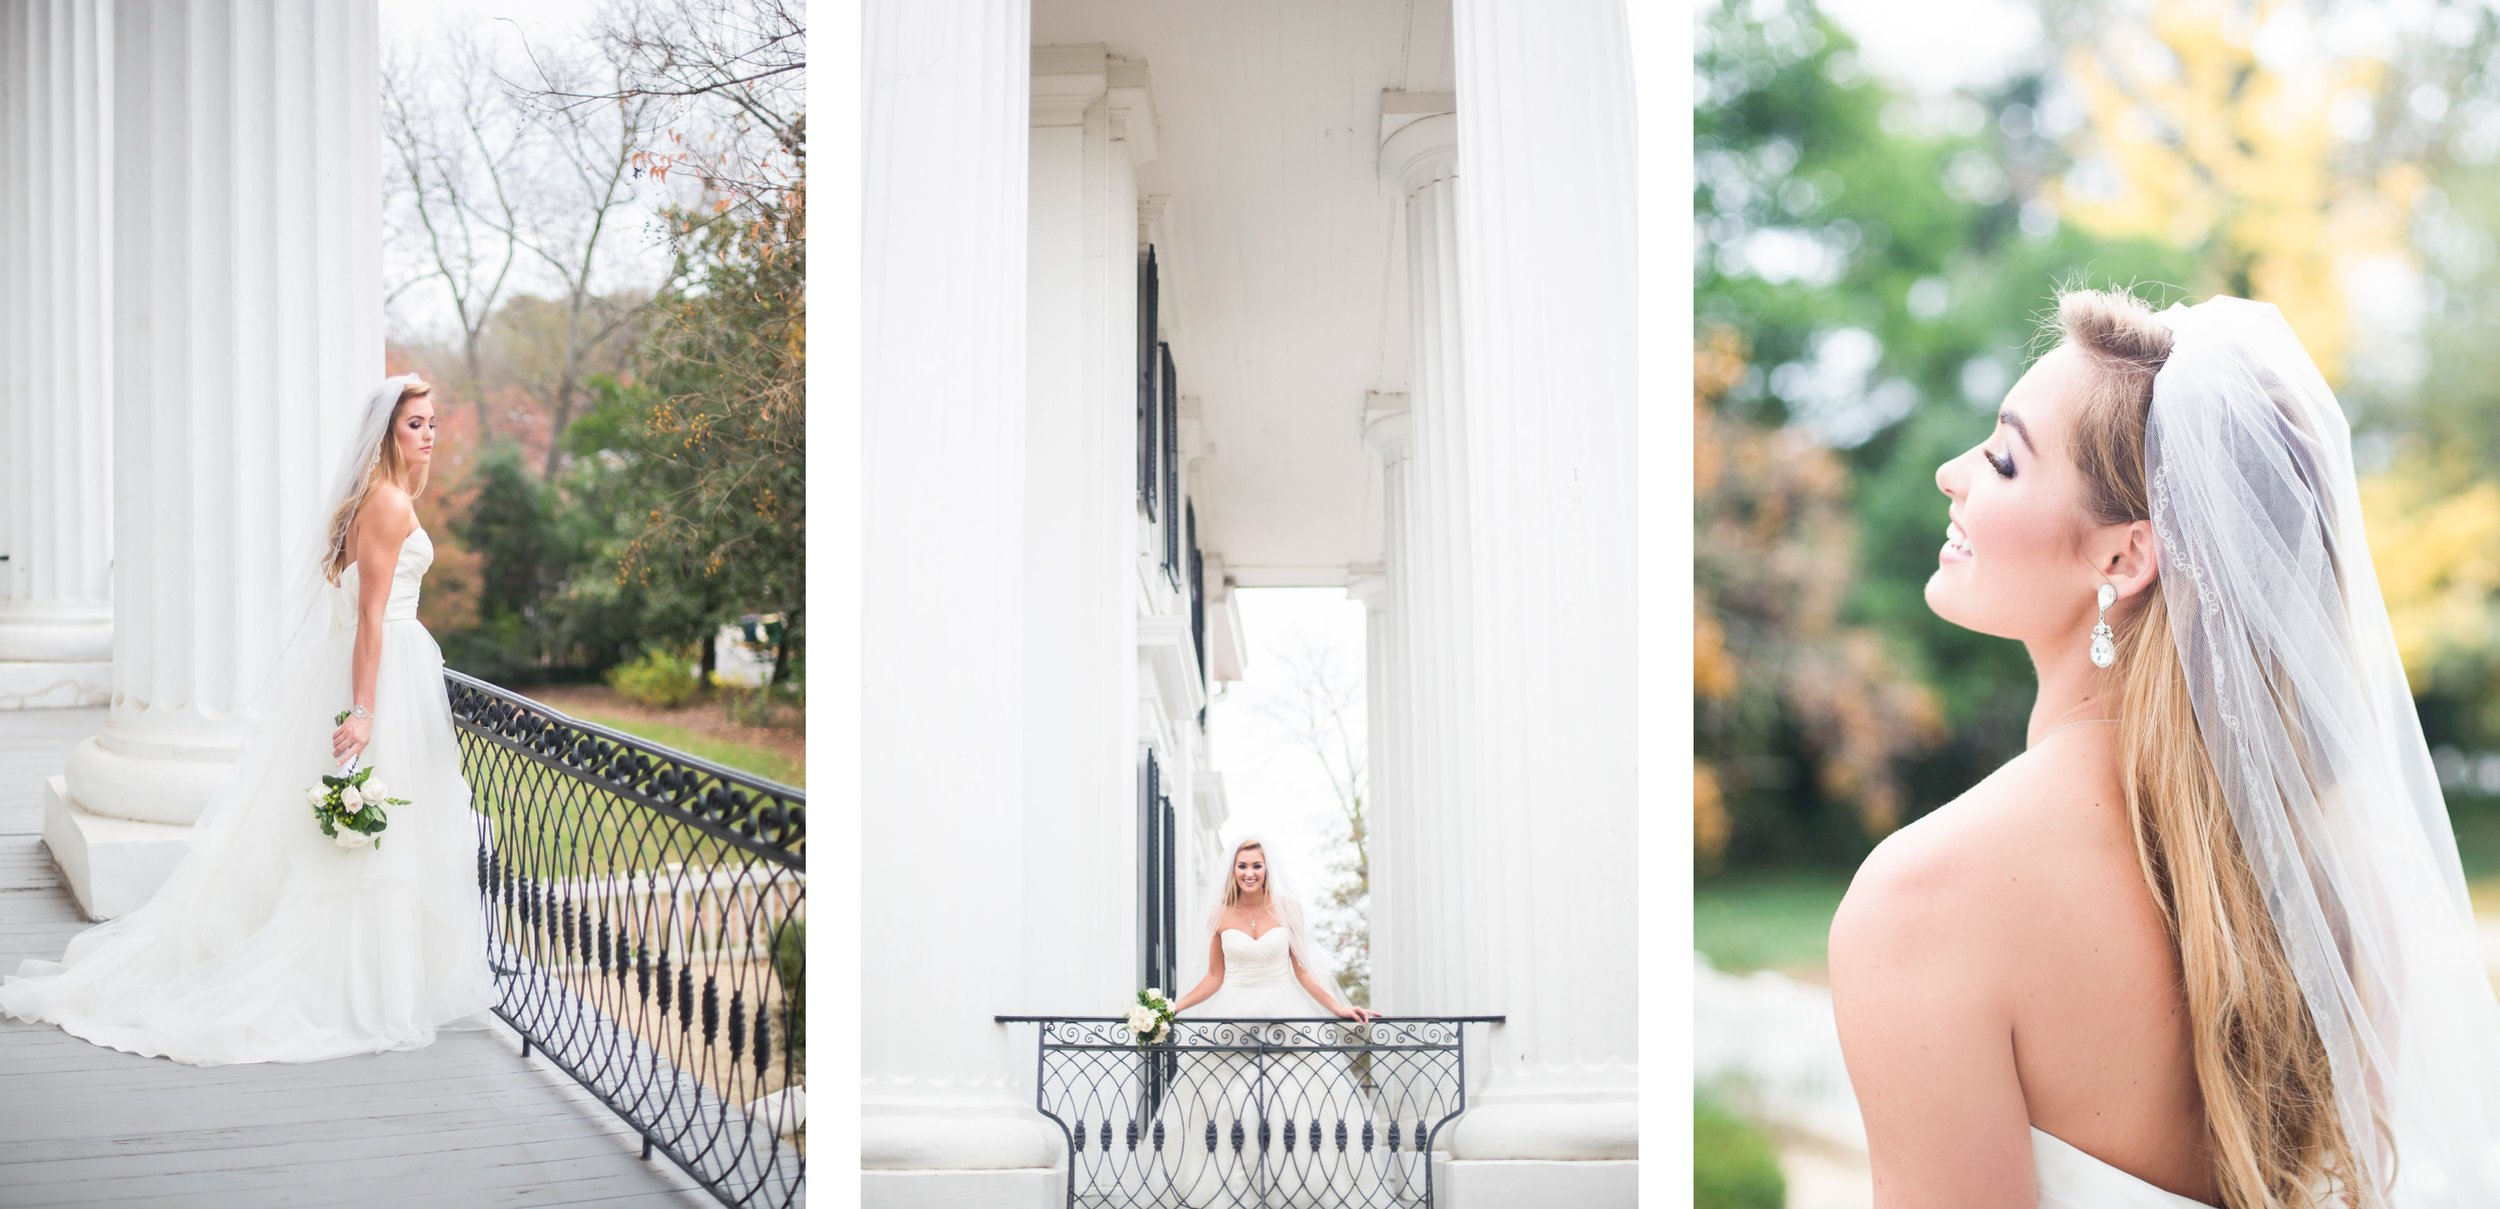 Rainey_Gregg_Photography_St._Simons_Island_Georgia_California_Wedding_Portrait_Photography_0248.jpg